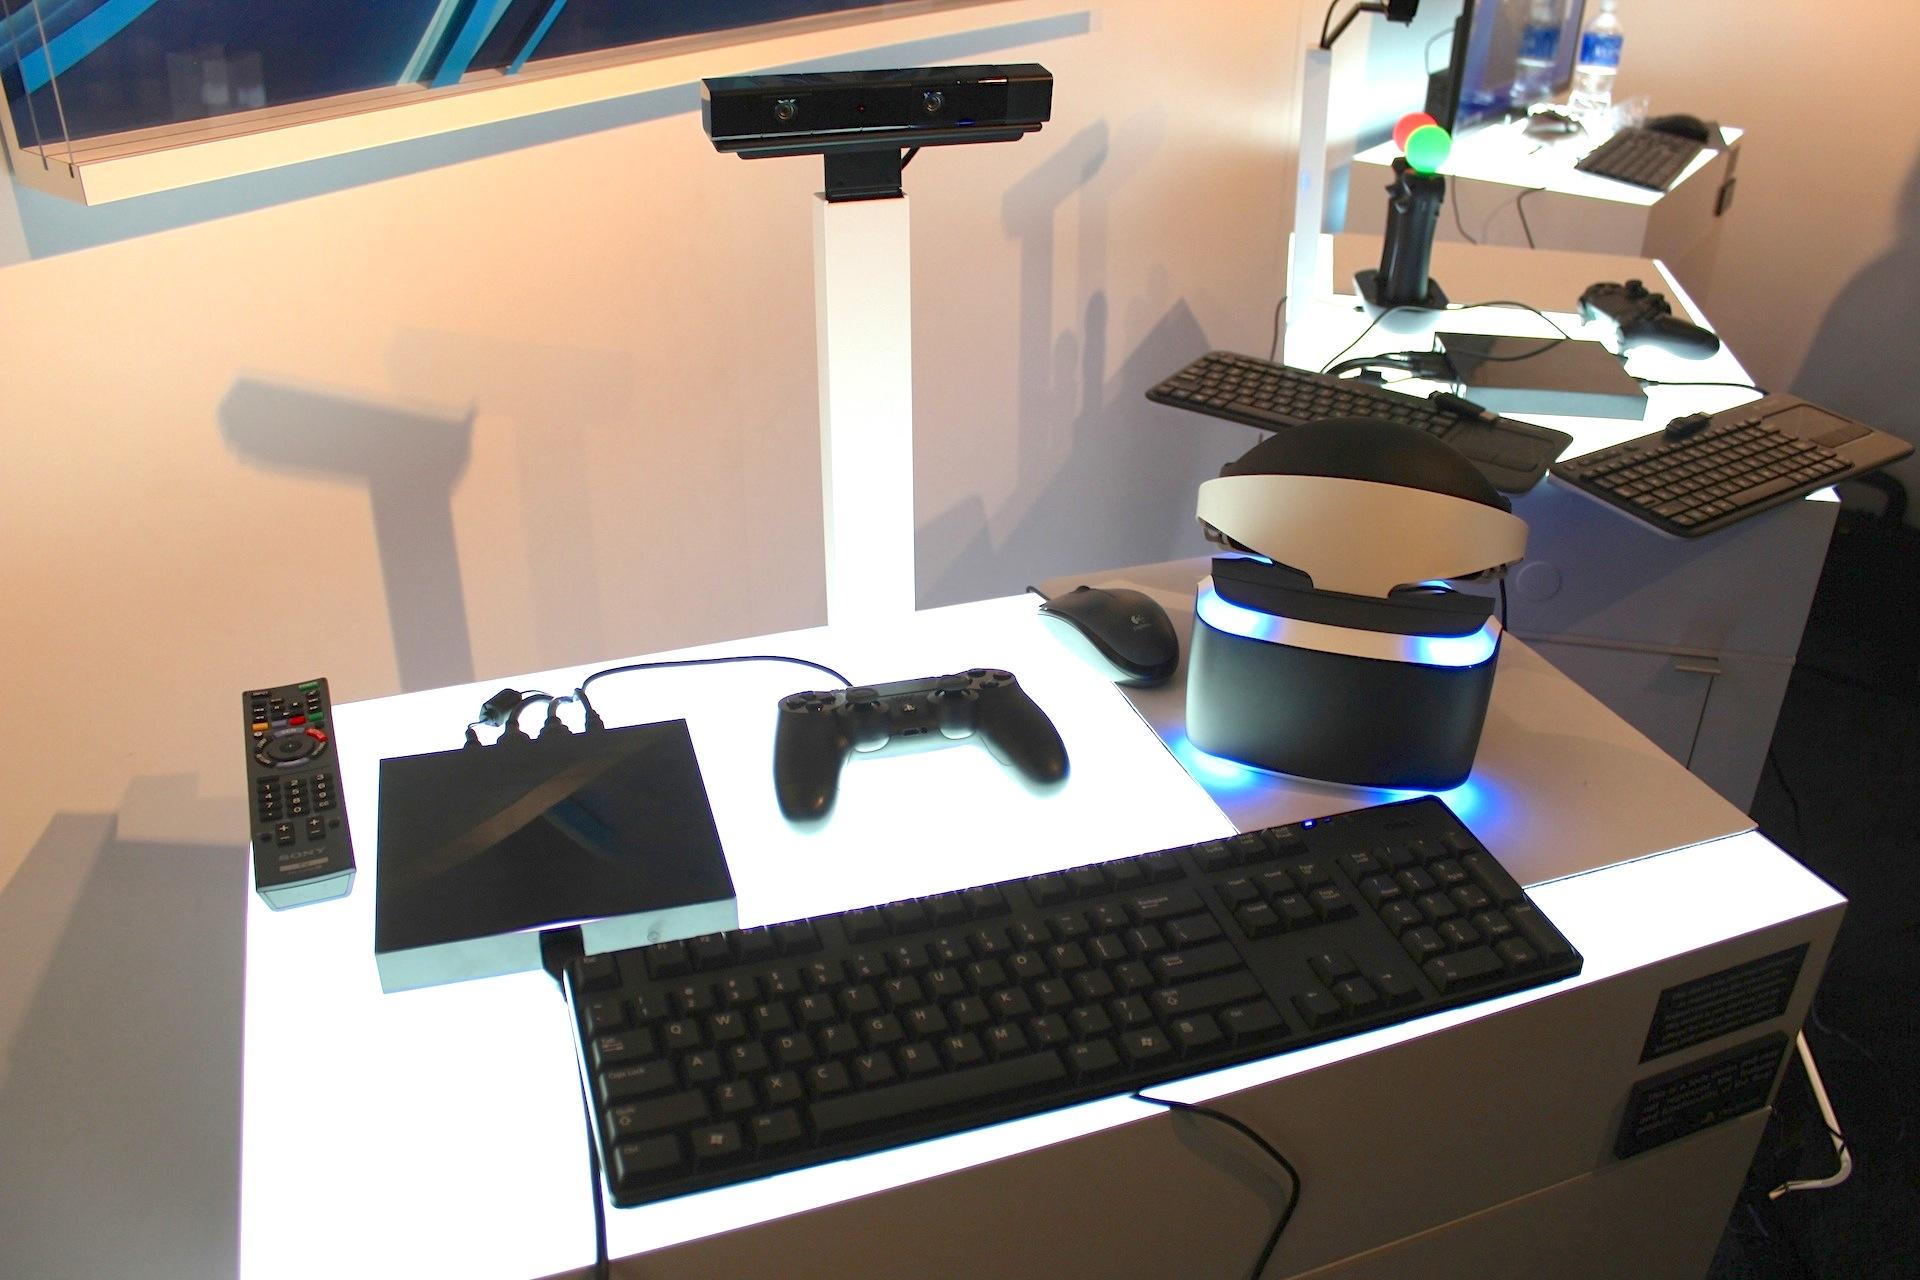 Project Morpheus setup